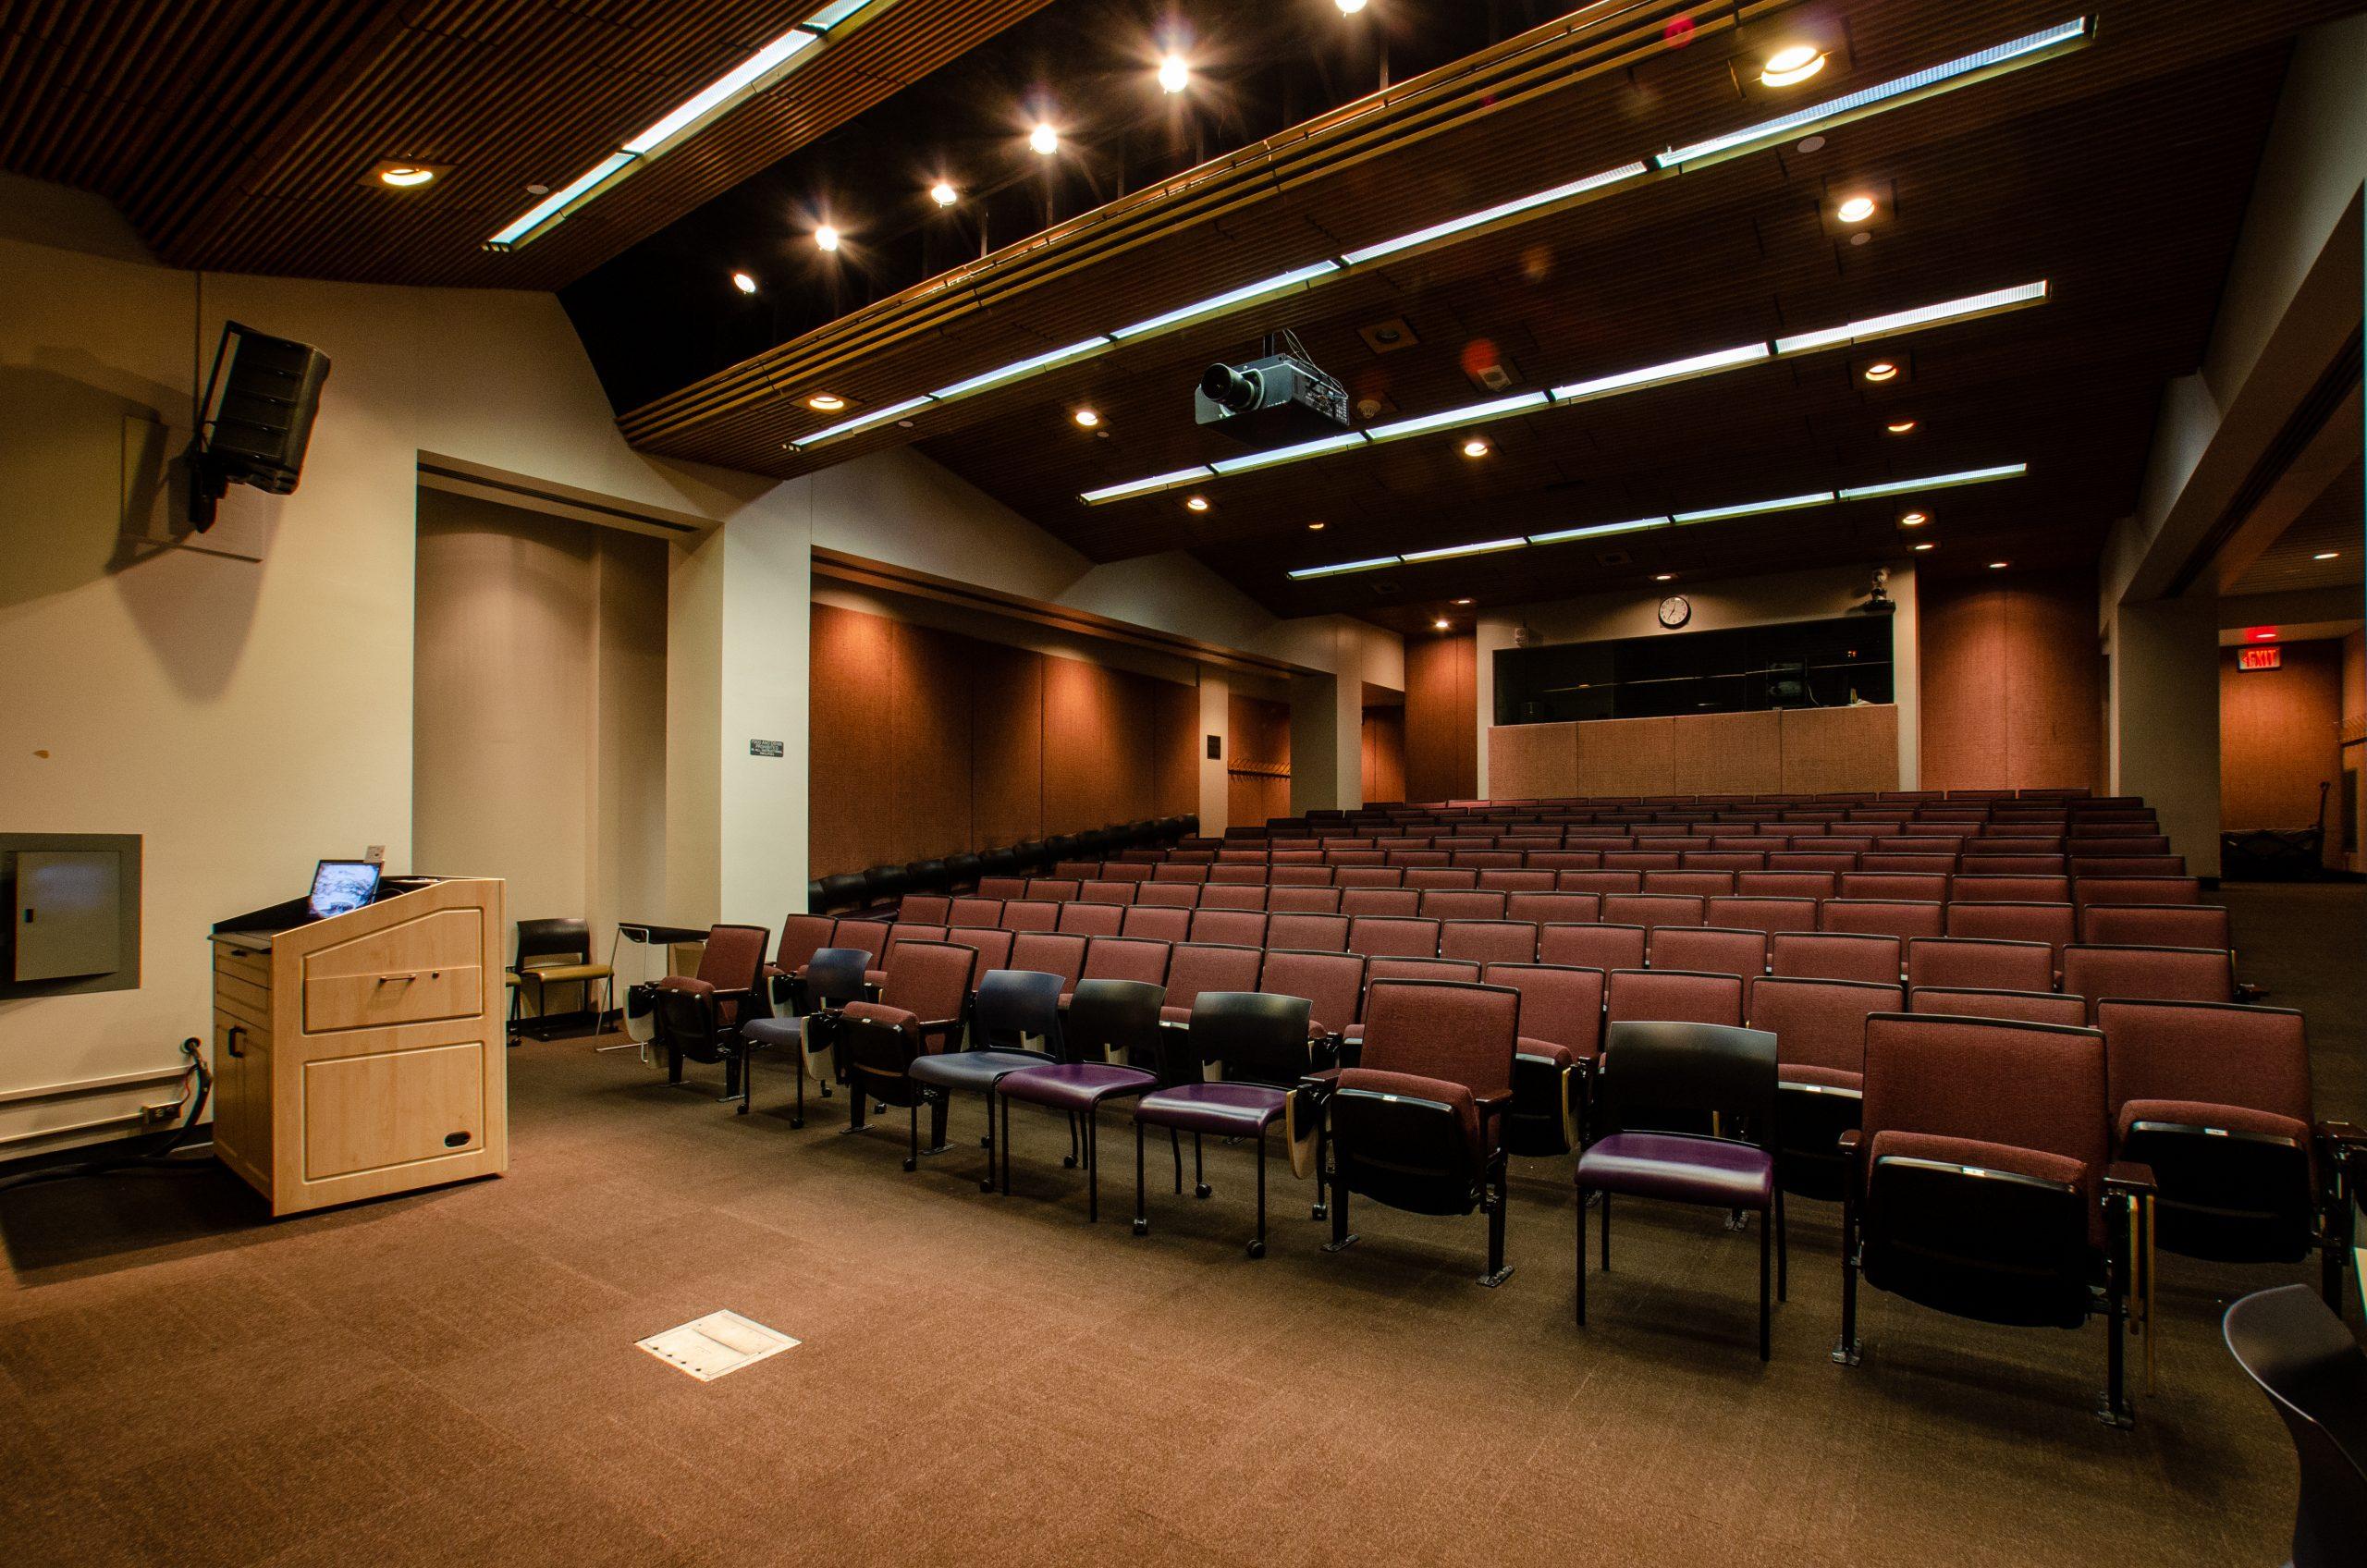 lindsay young auditorium